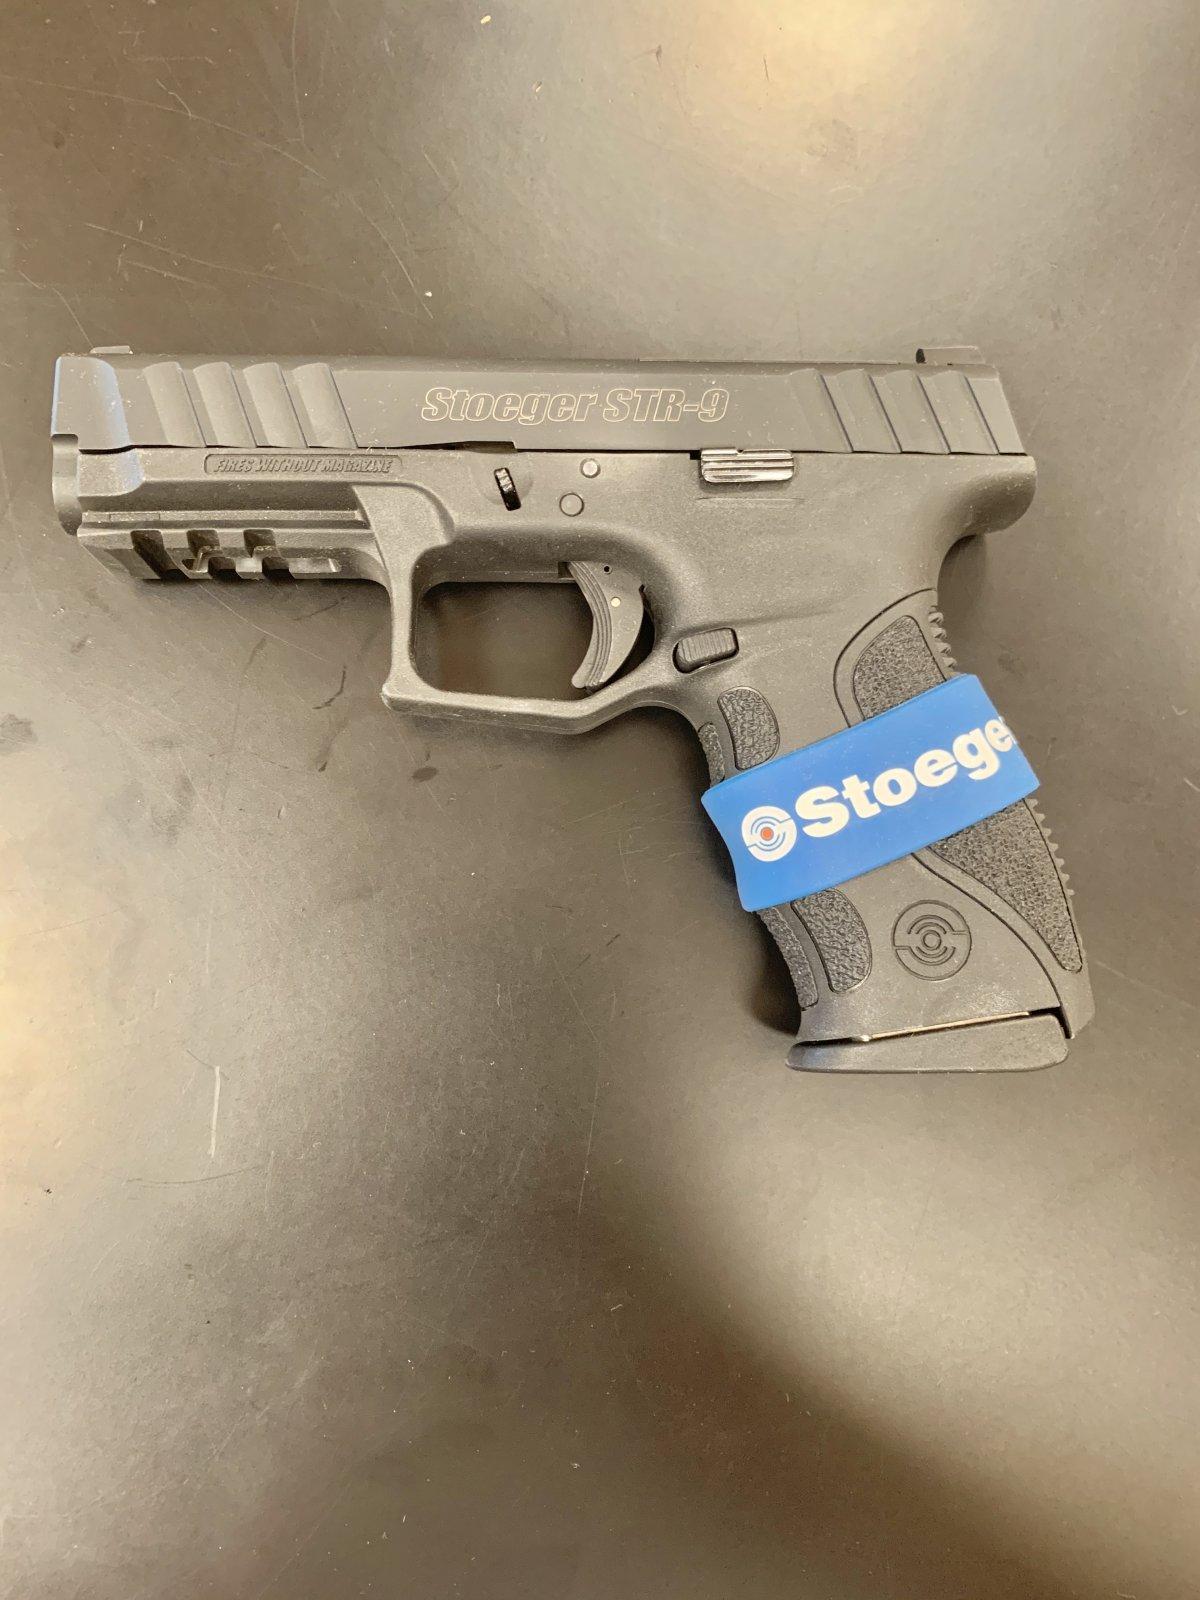 Stoeger STR-9 Semi Automatic Pistol - Black